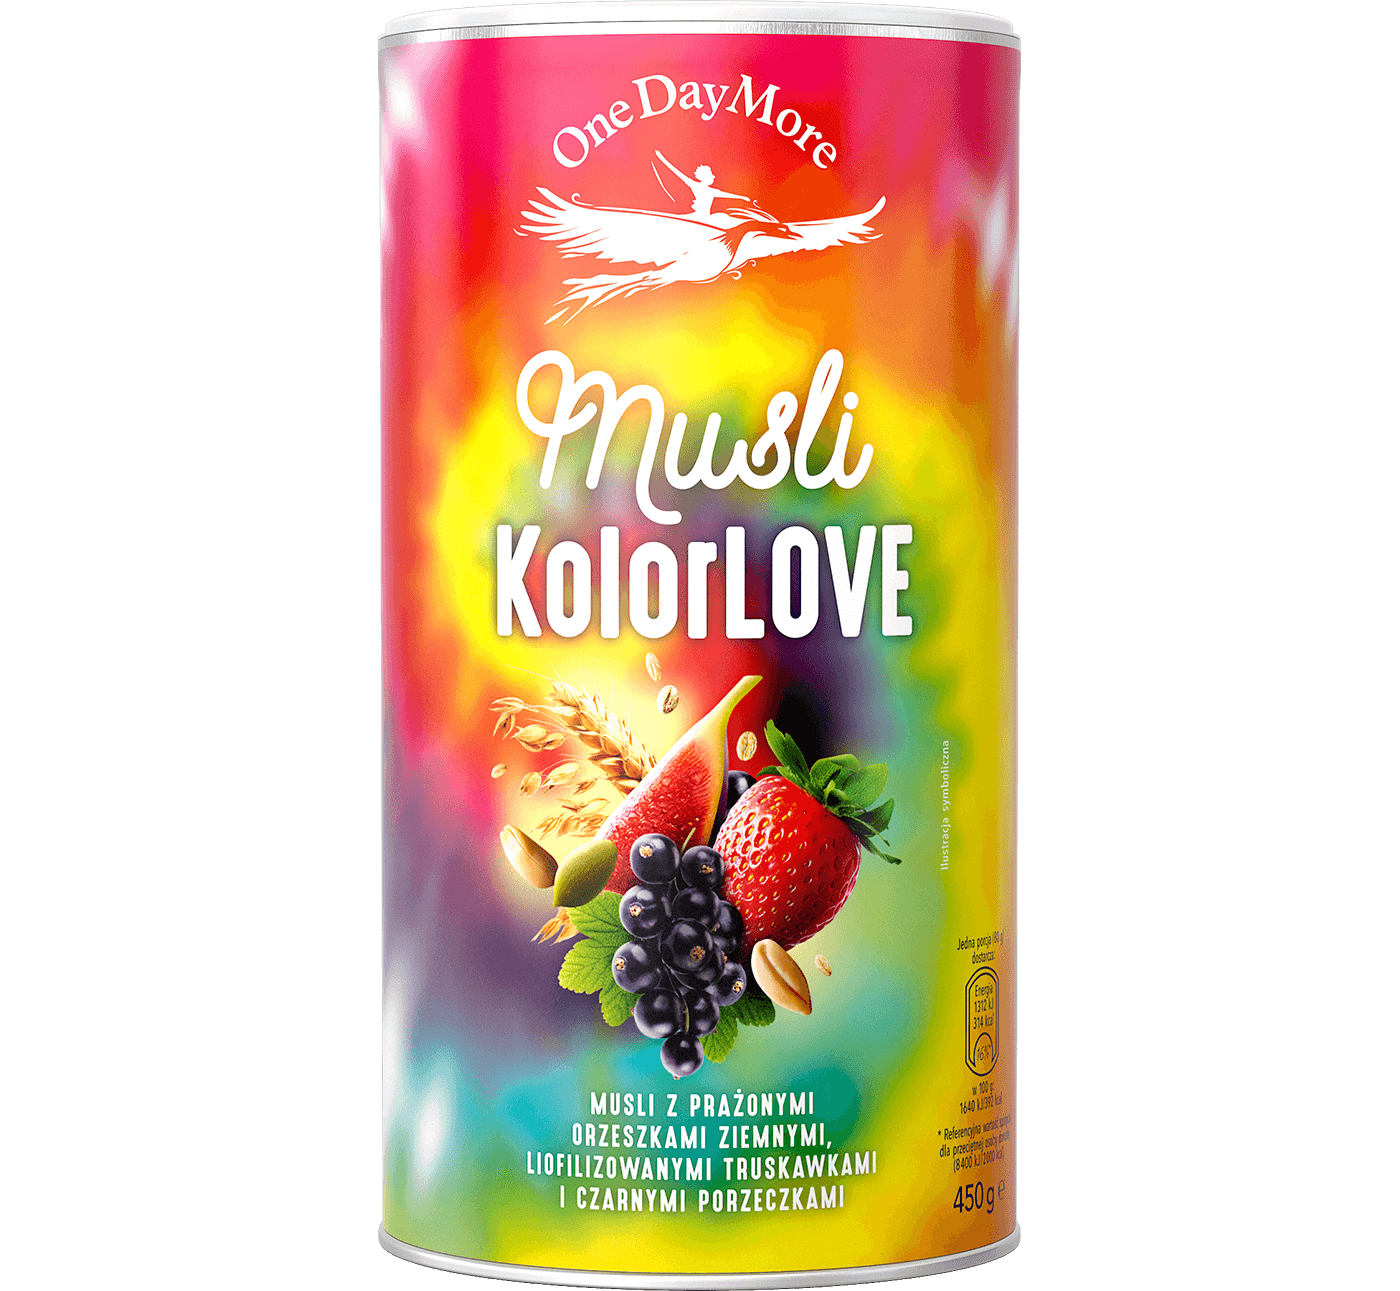 PL_Musli_KolorLOVE_front_1400x1291